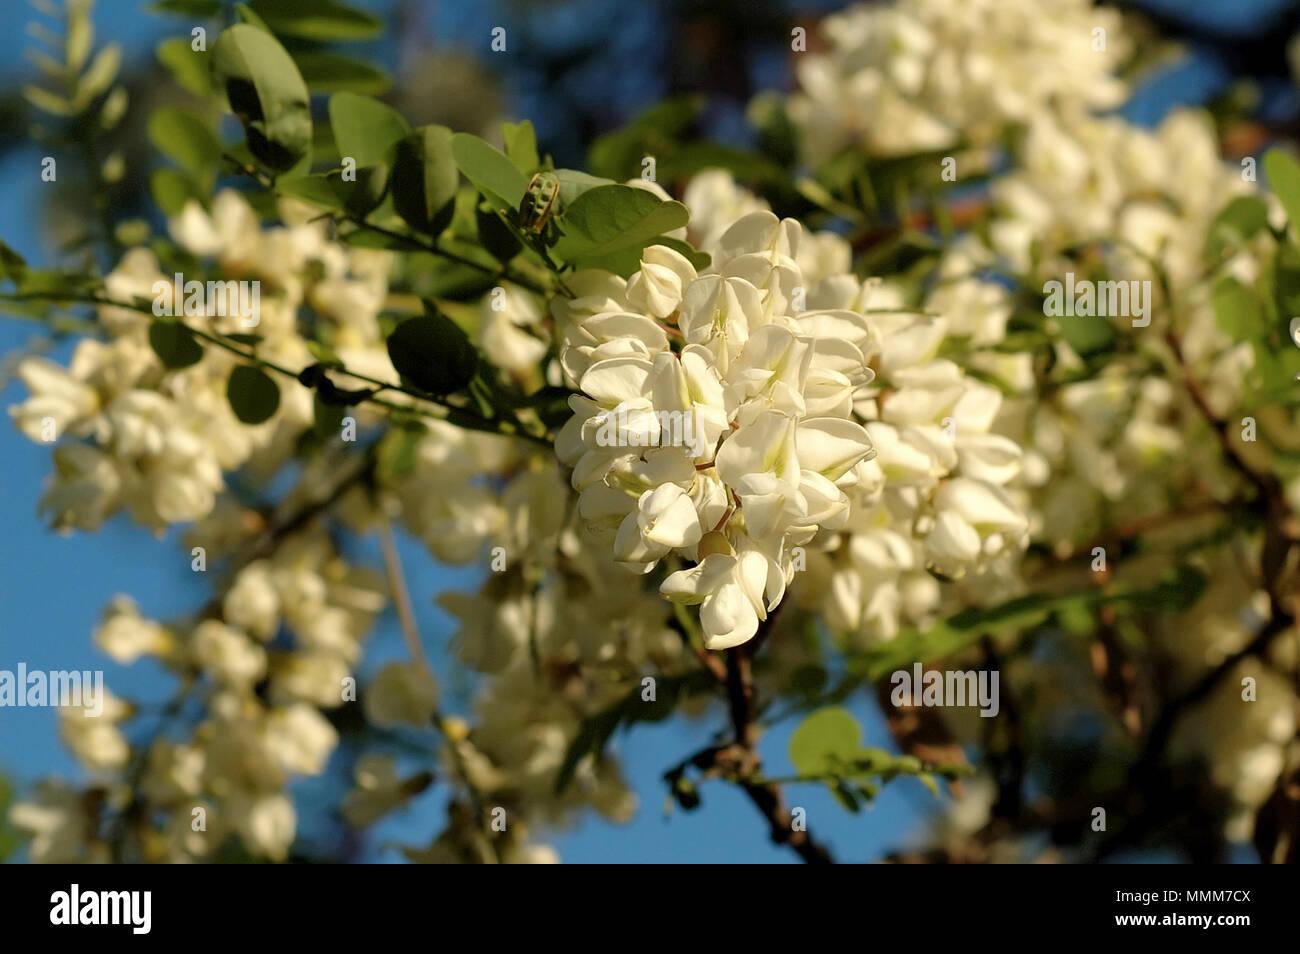 Acacia tree blooms white flowers stock photo 184841690 alamy acacia tree blooms white flowers mightylinksfo